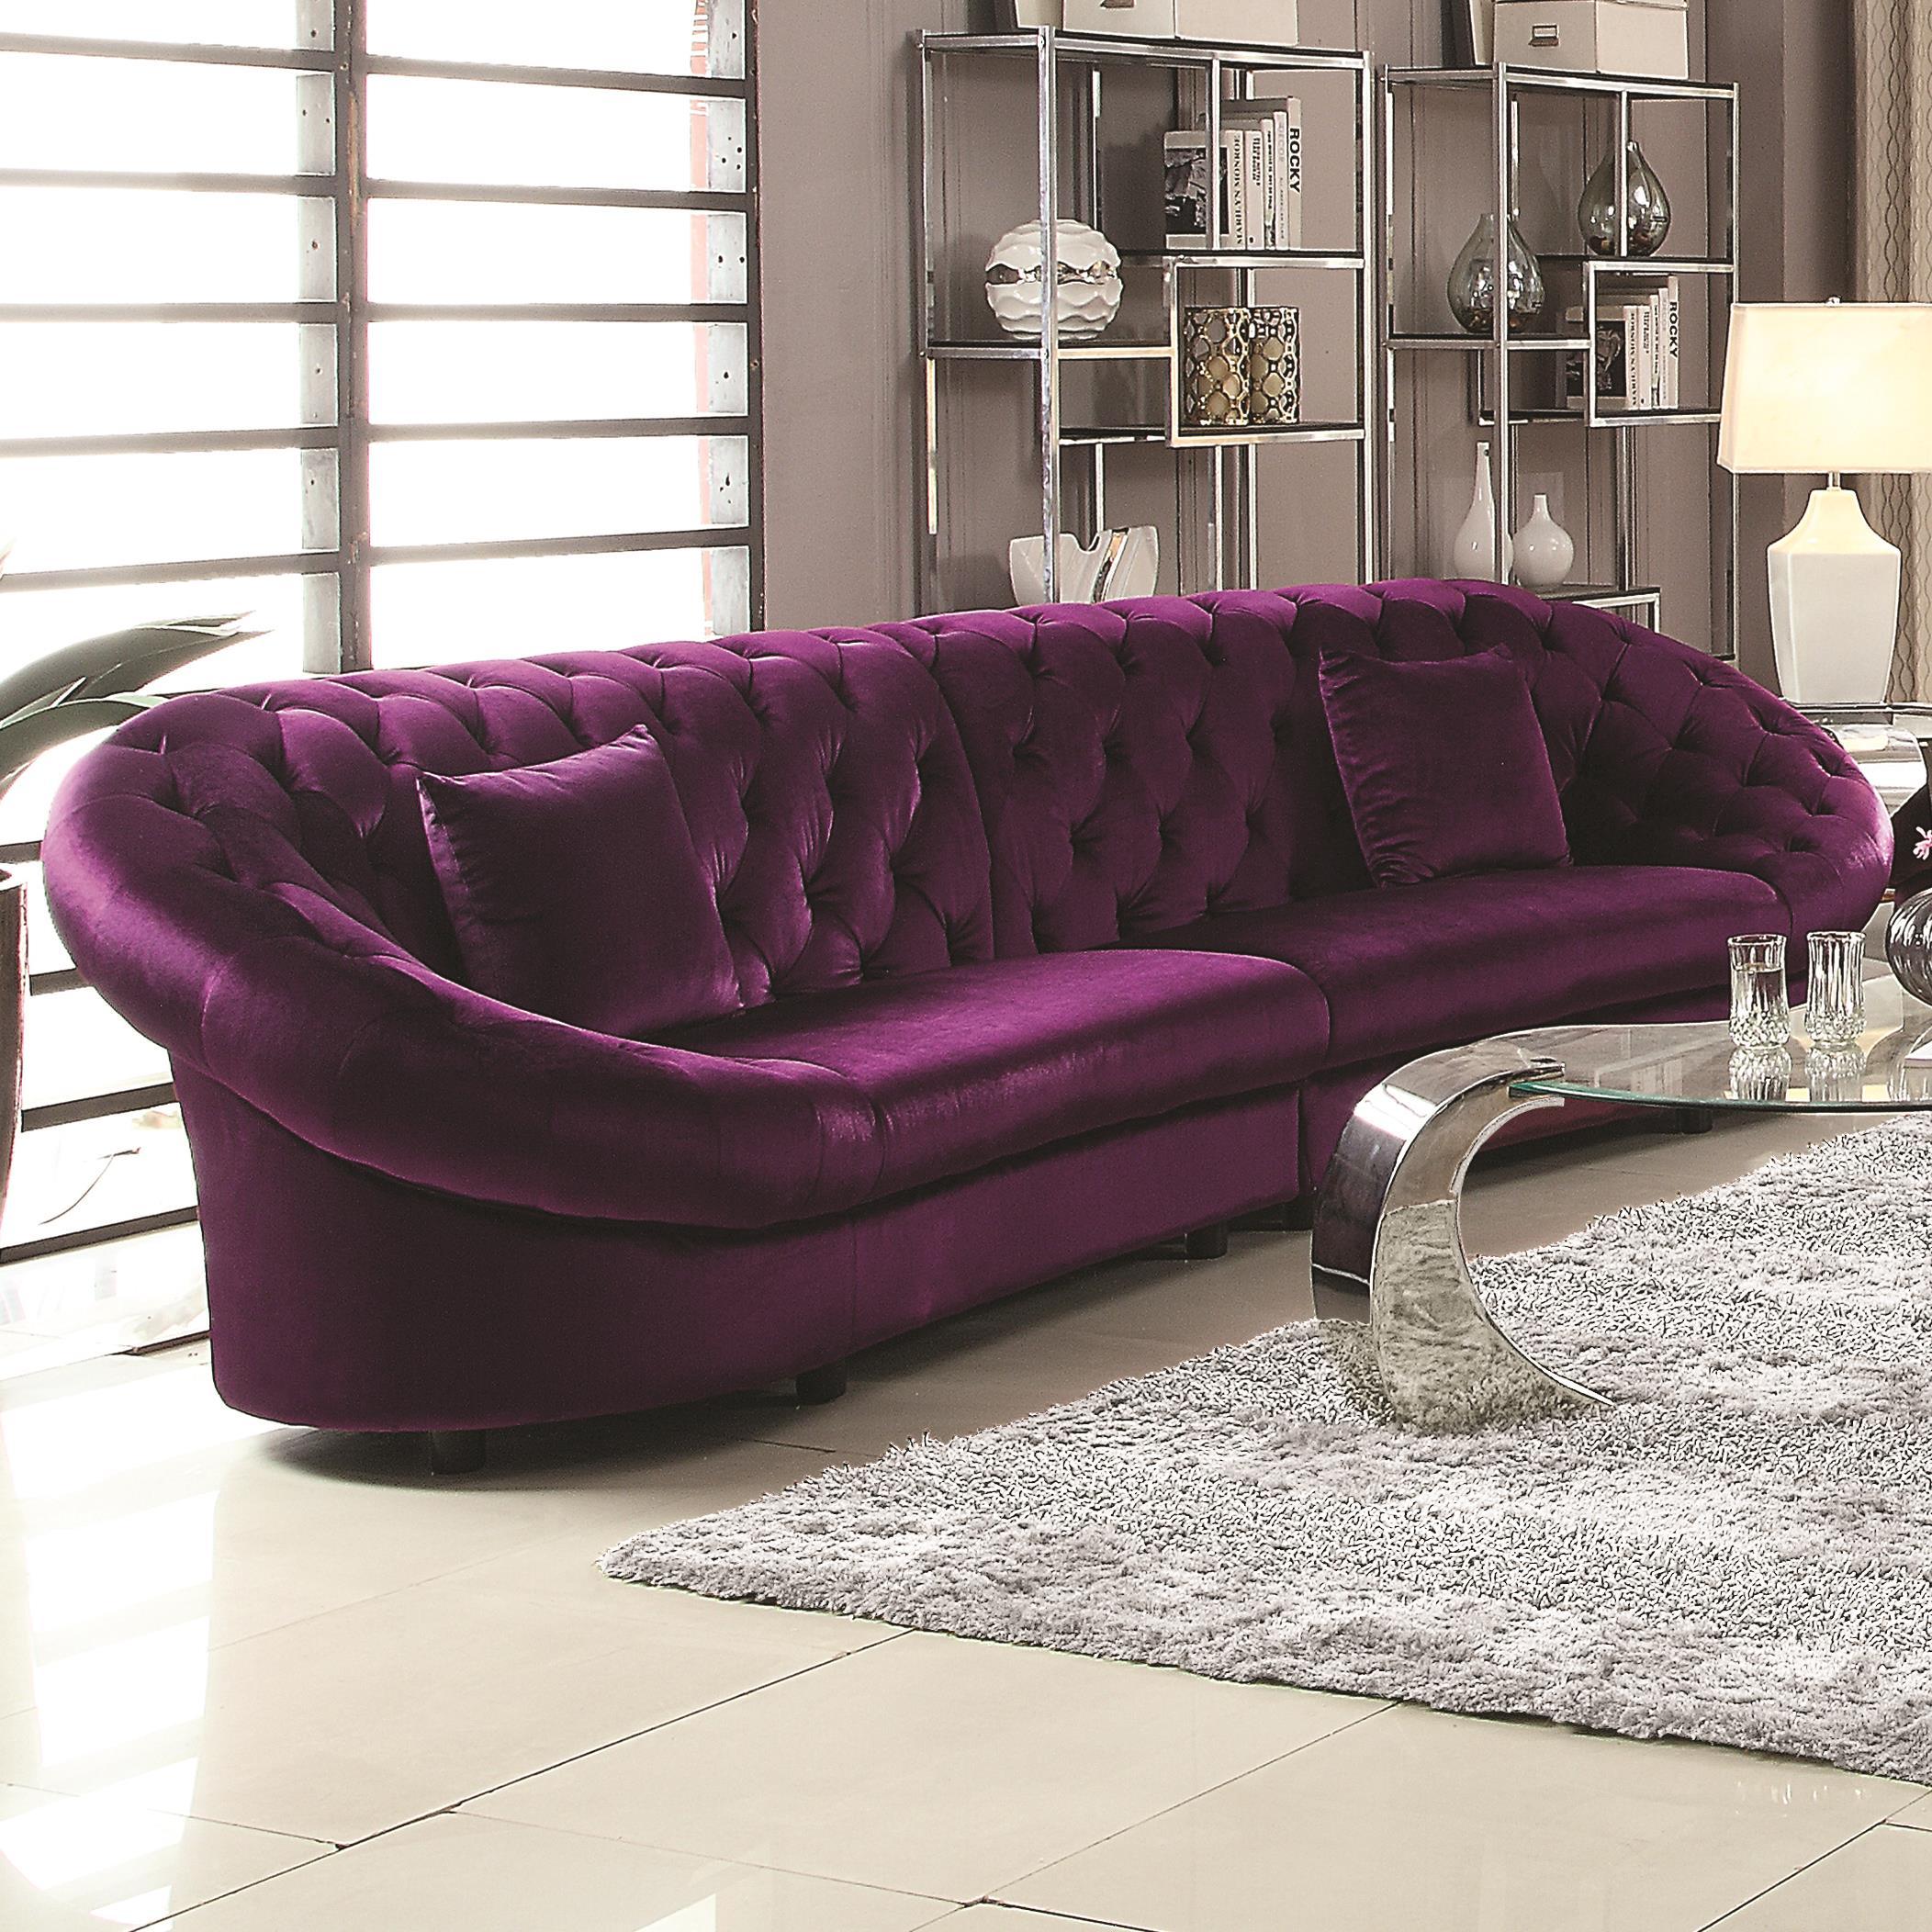 Coaster Romanus Sectional Sofa - Item Number: 511045